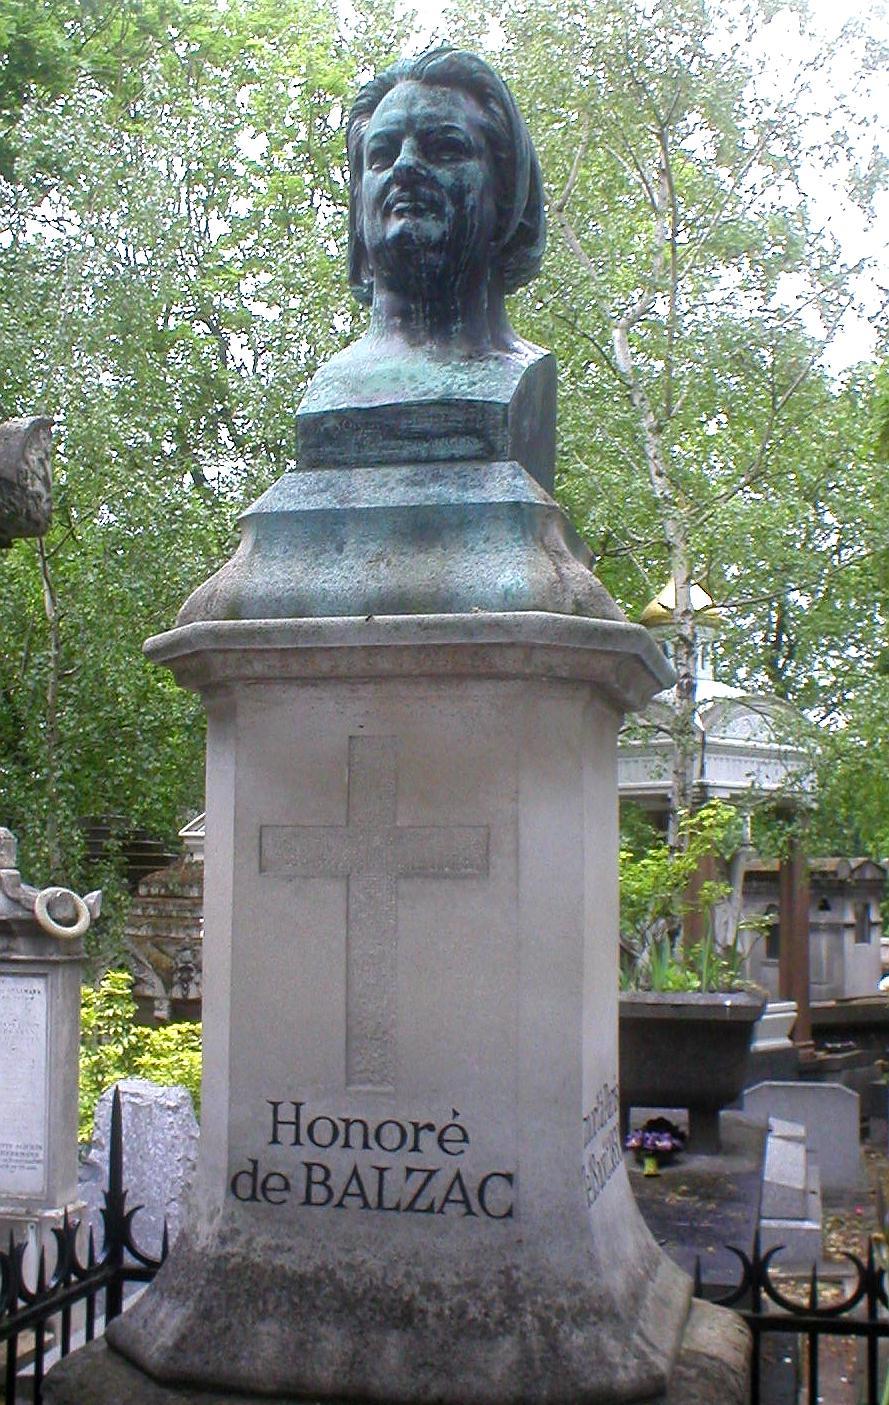 http://upload.wikimedia.org/wikipedia/commons/5/53/Balzac-Pere-Lachaise.jpg